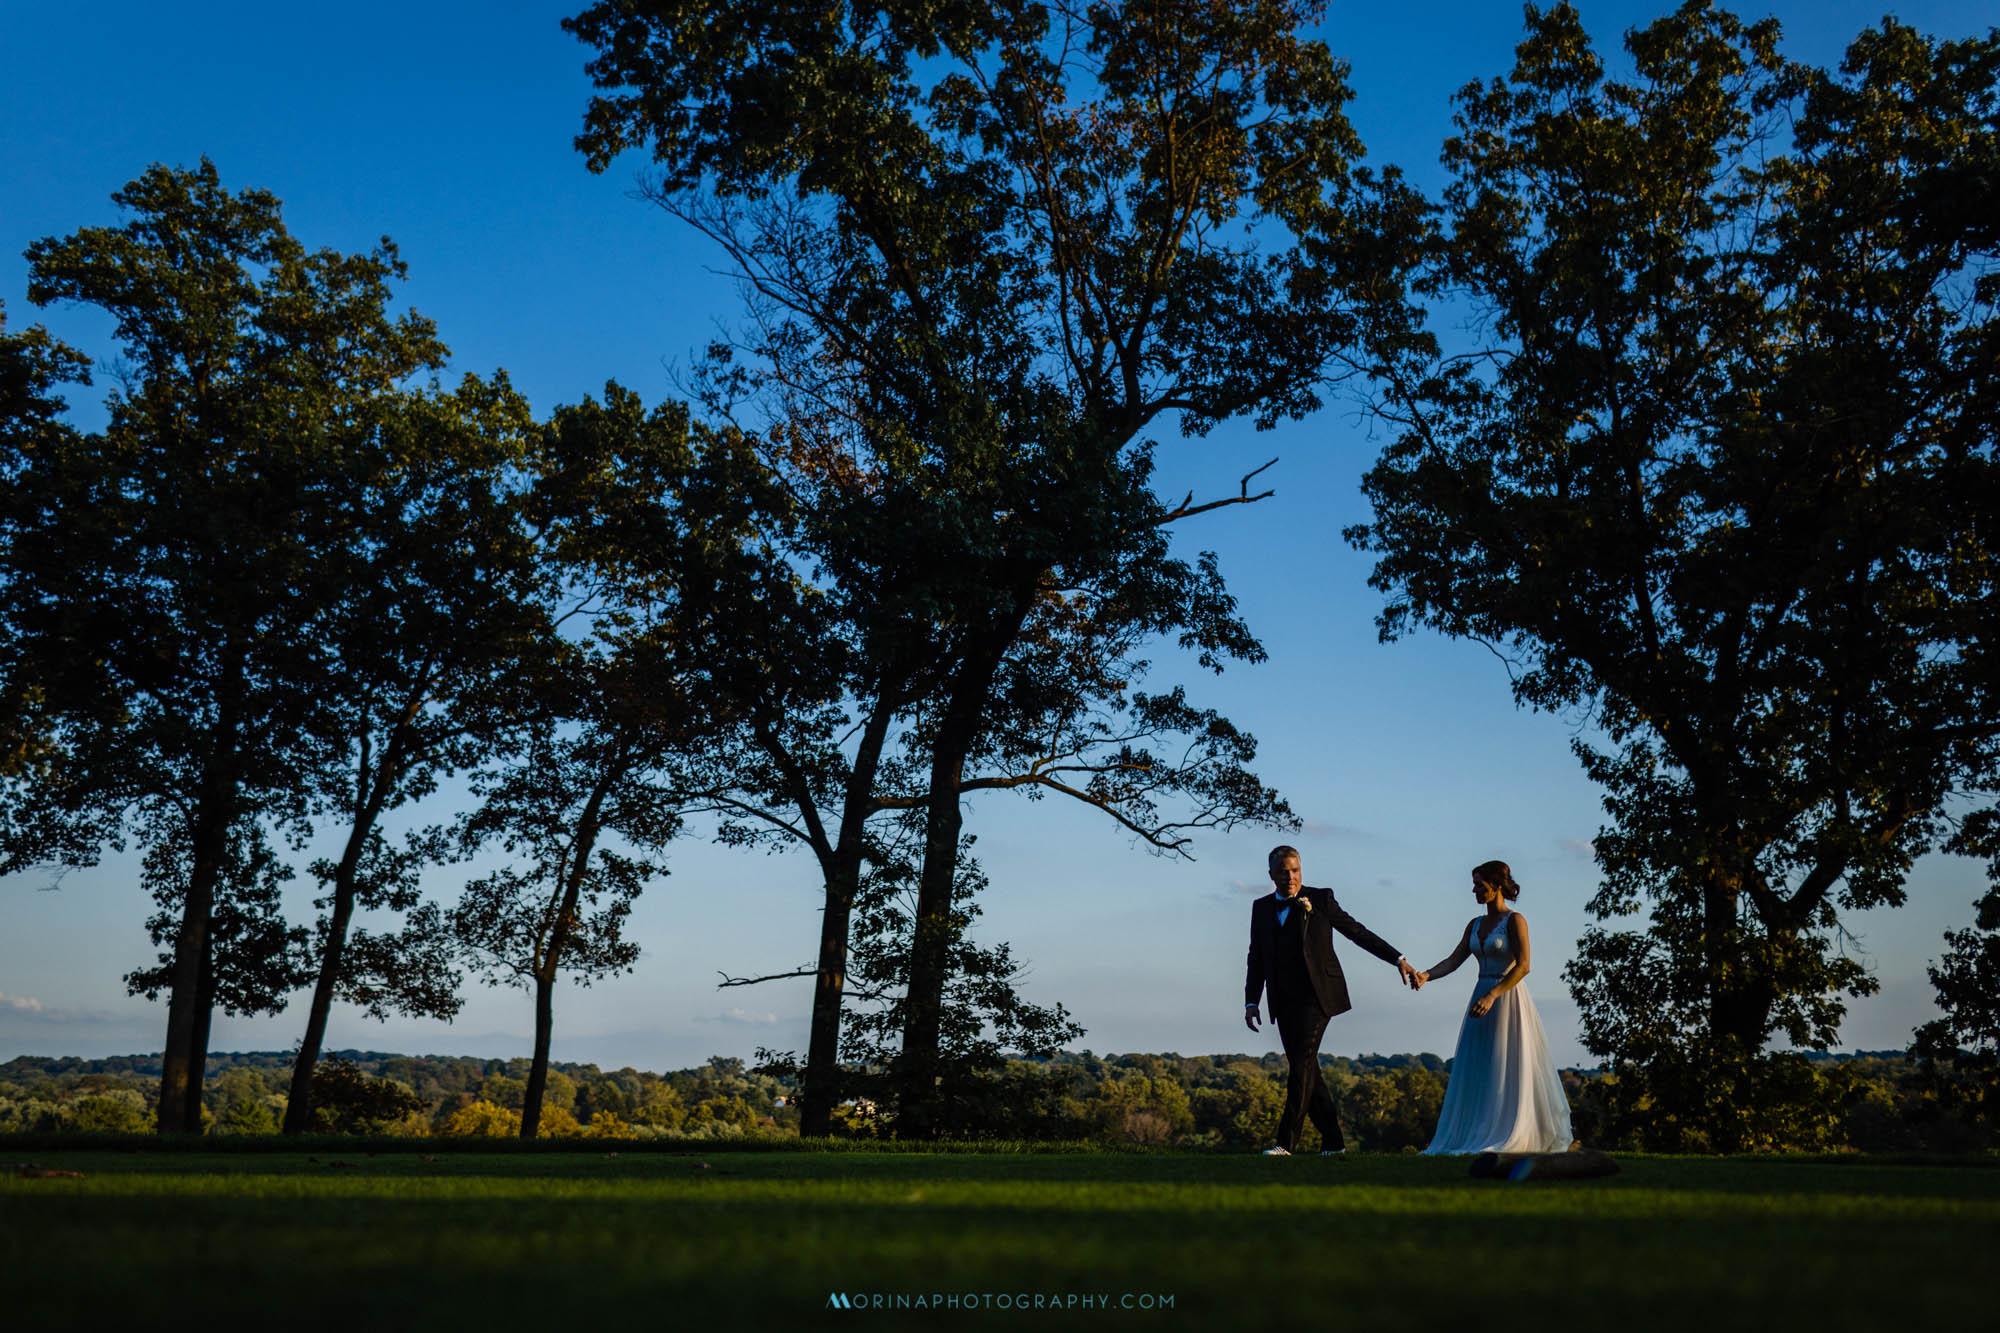 Colleen & Bill Wedding at Manufacturers' Golf & Country Club wedding 0061.jpg